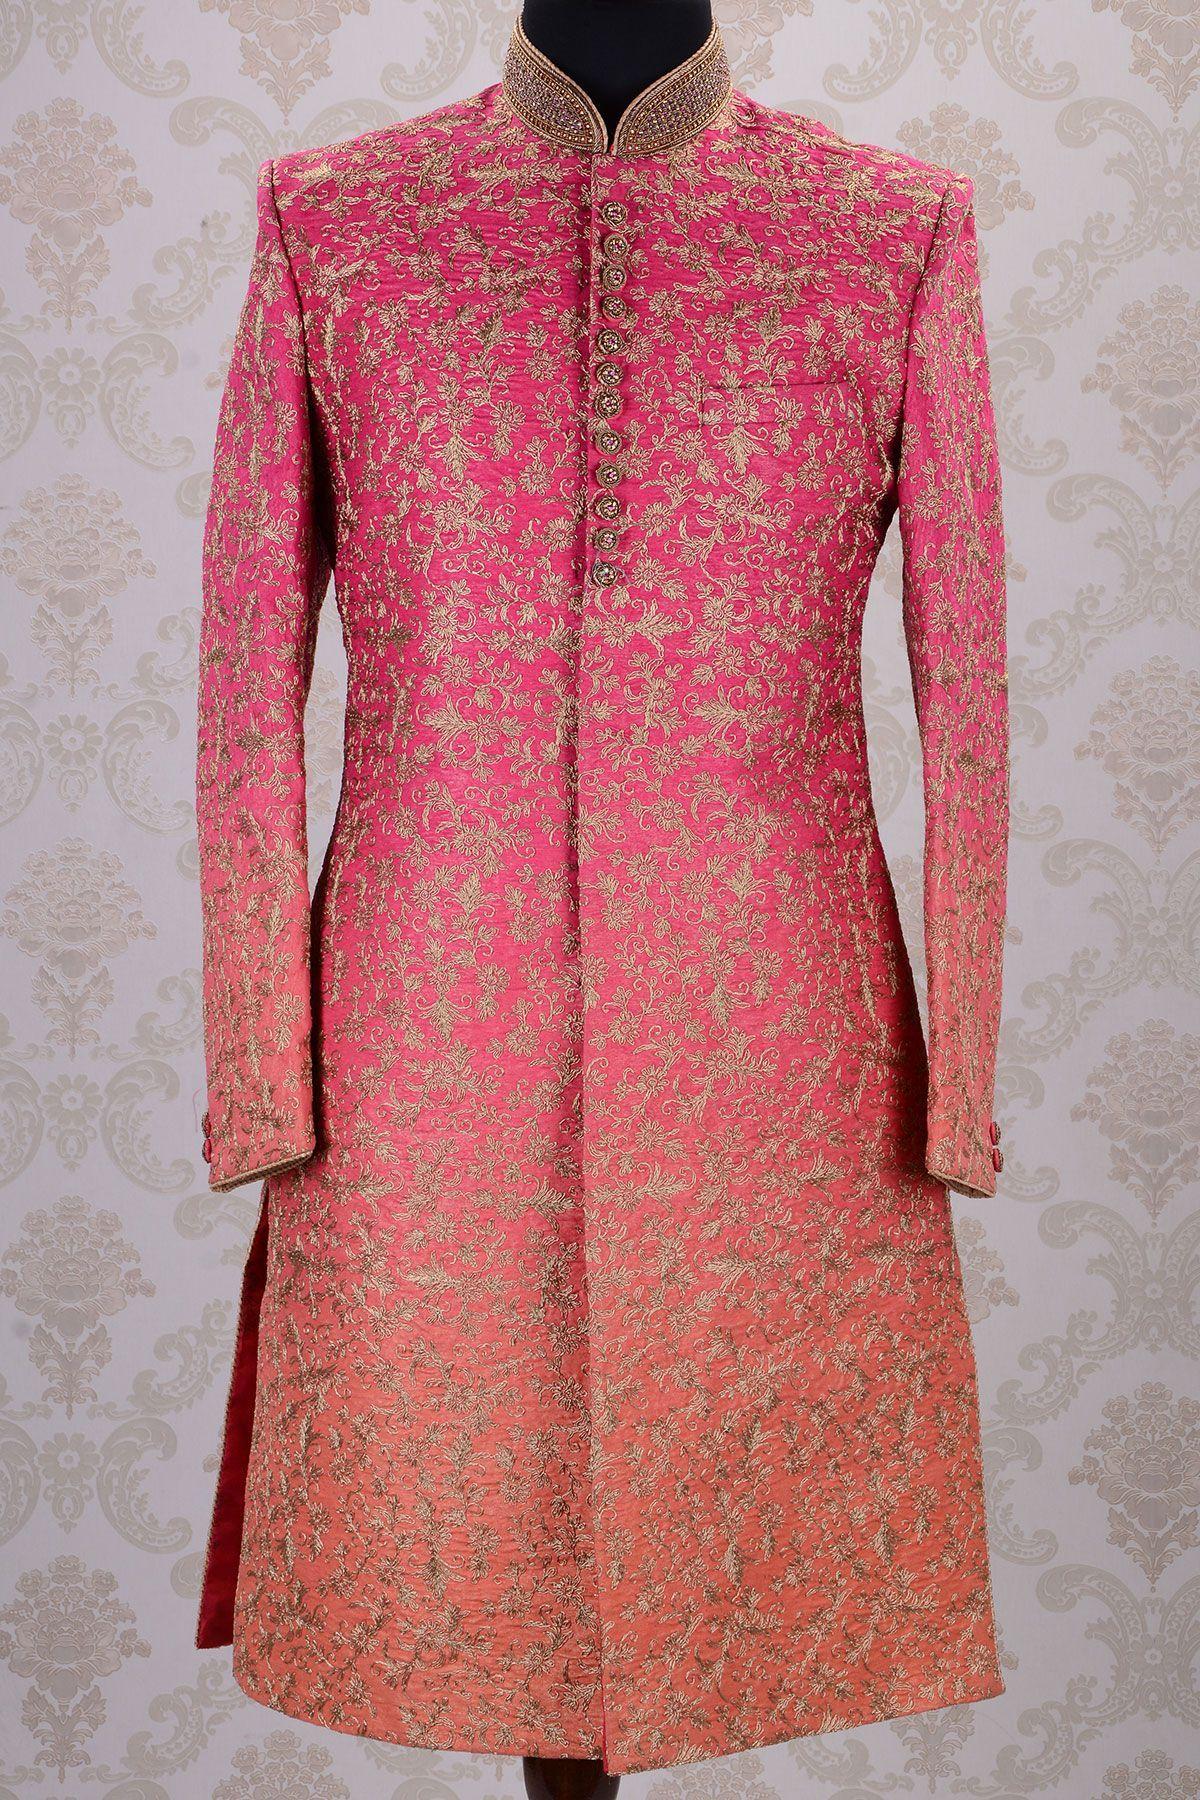 Wedding Sherwani-Shaded Pink & Orange-Zari Work-SH275 | traditional ...